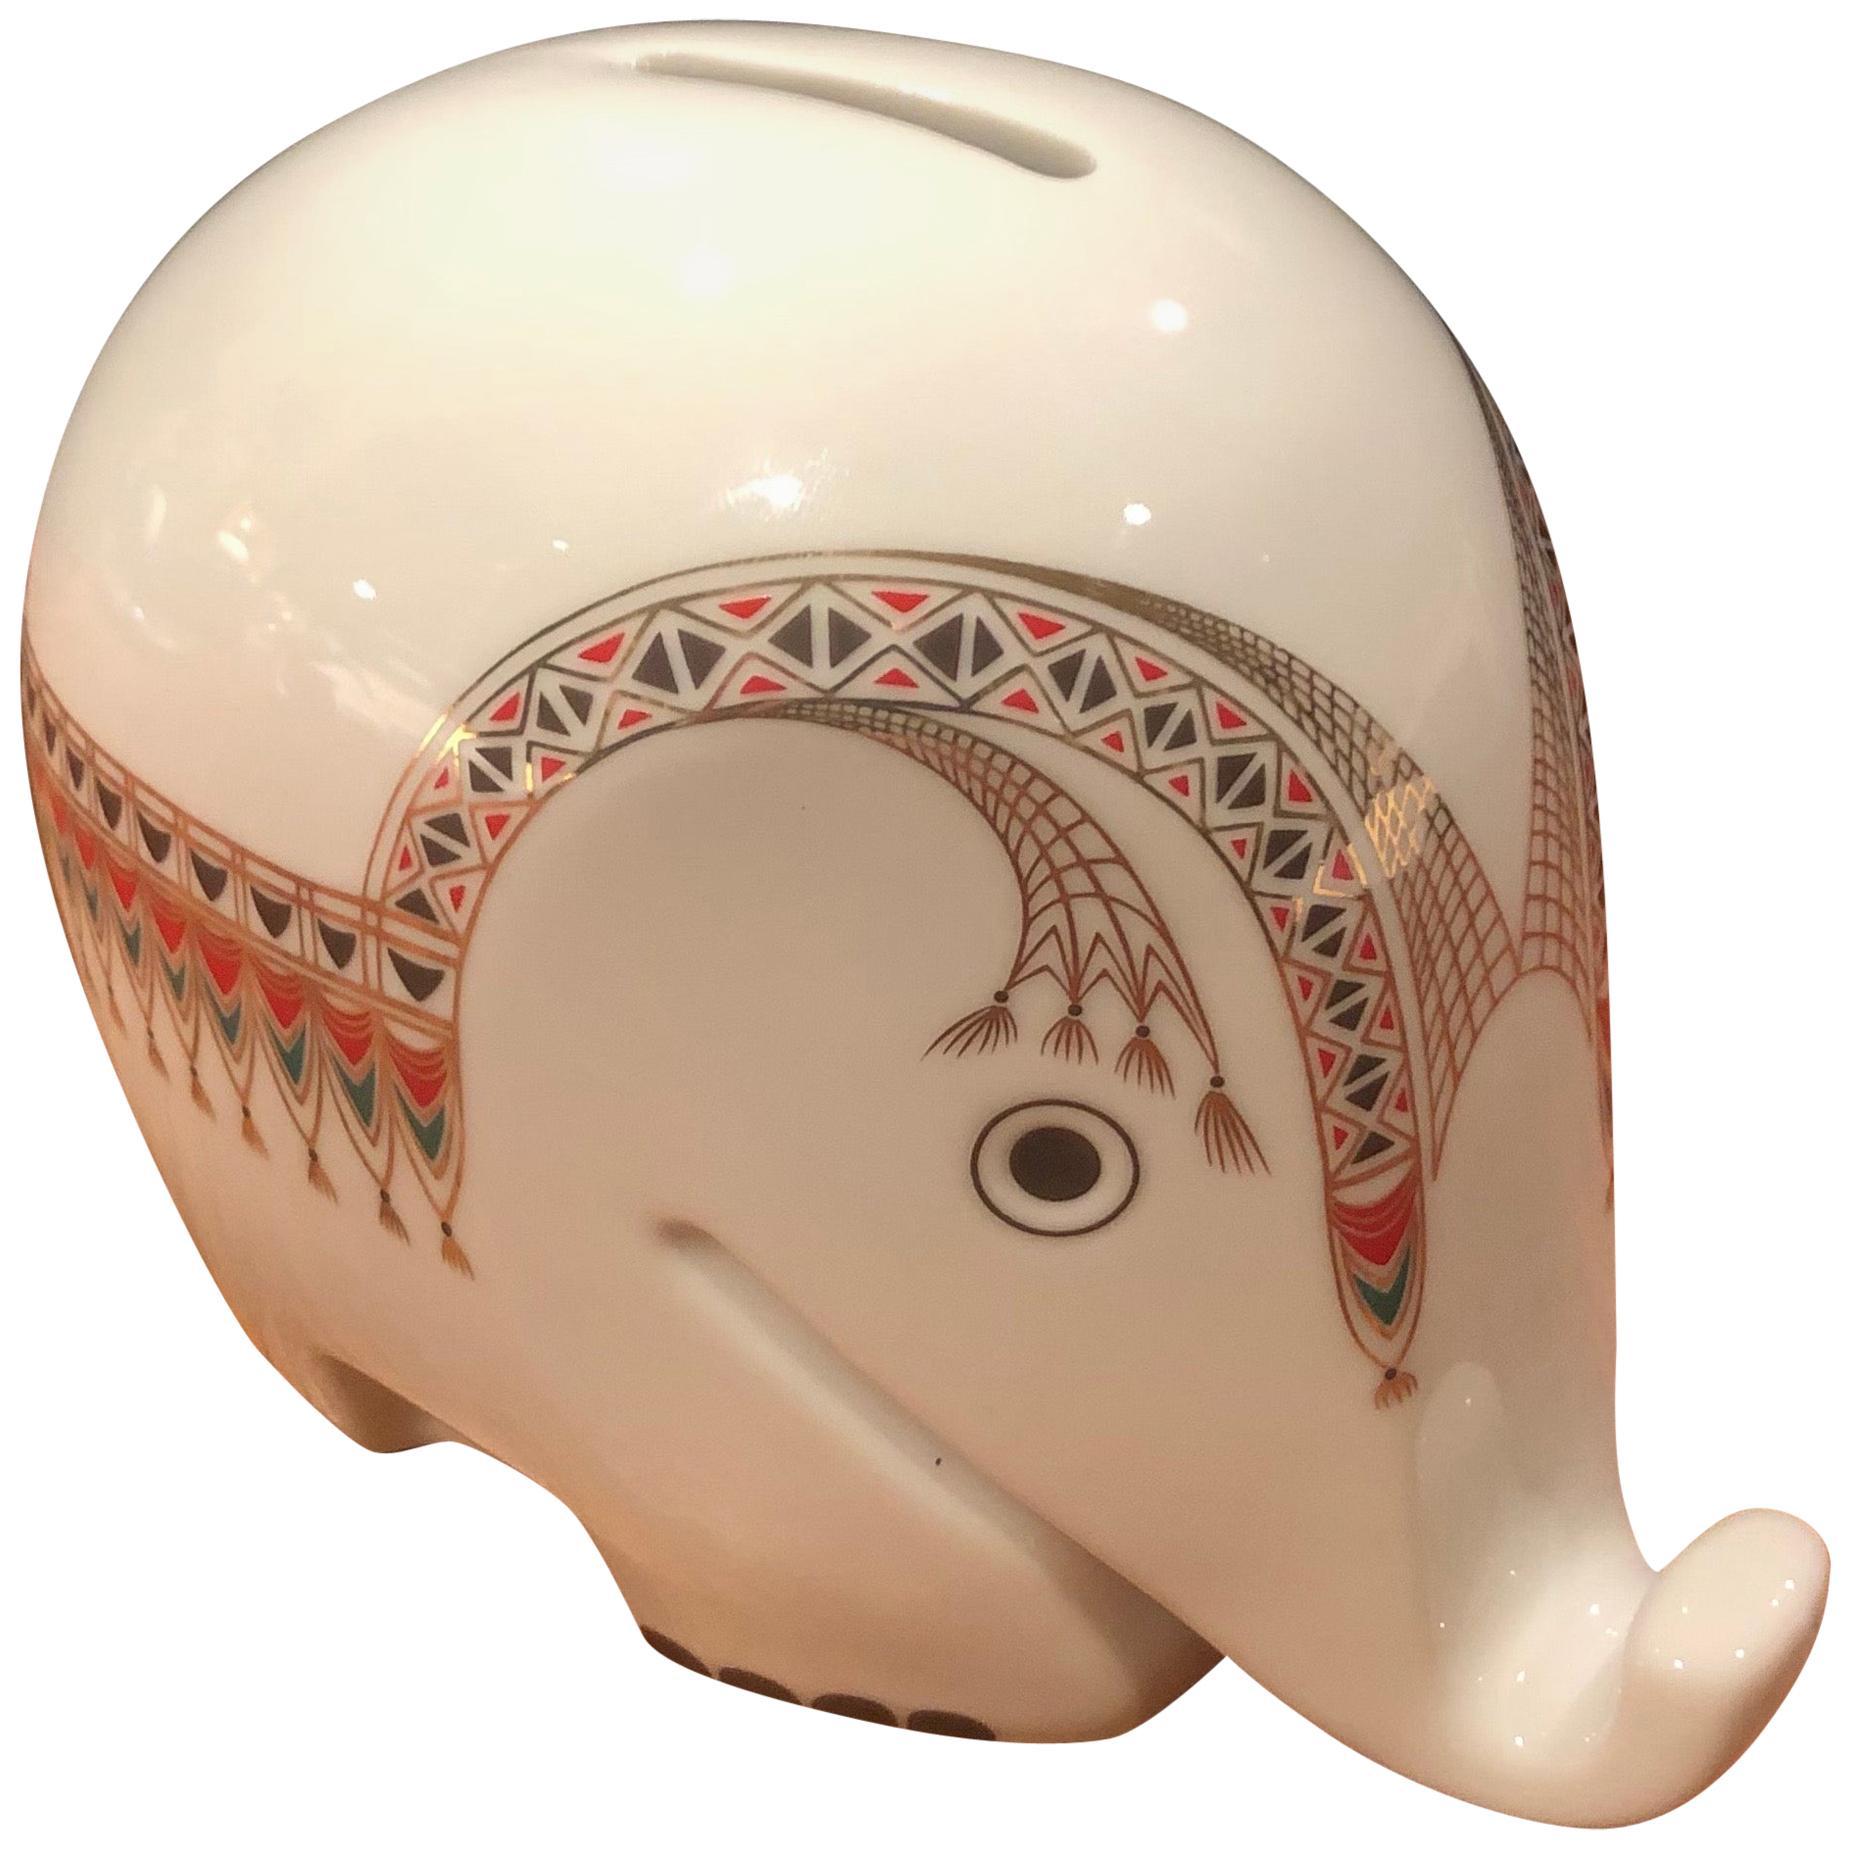 "Modern Porcelain Piggy Bank ""Drumbo"" by Luigi Colani for Hochst"